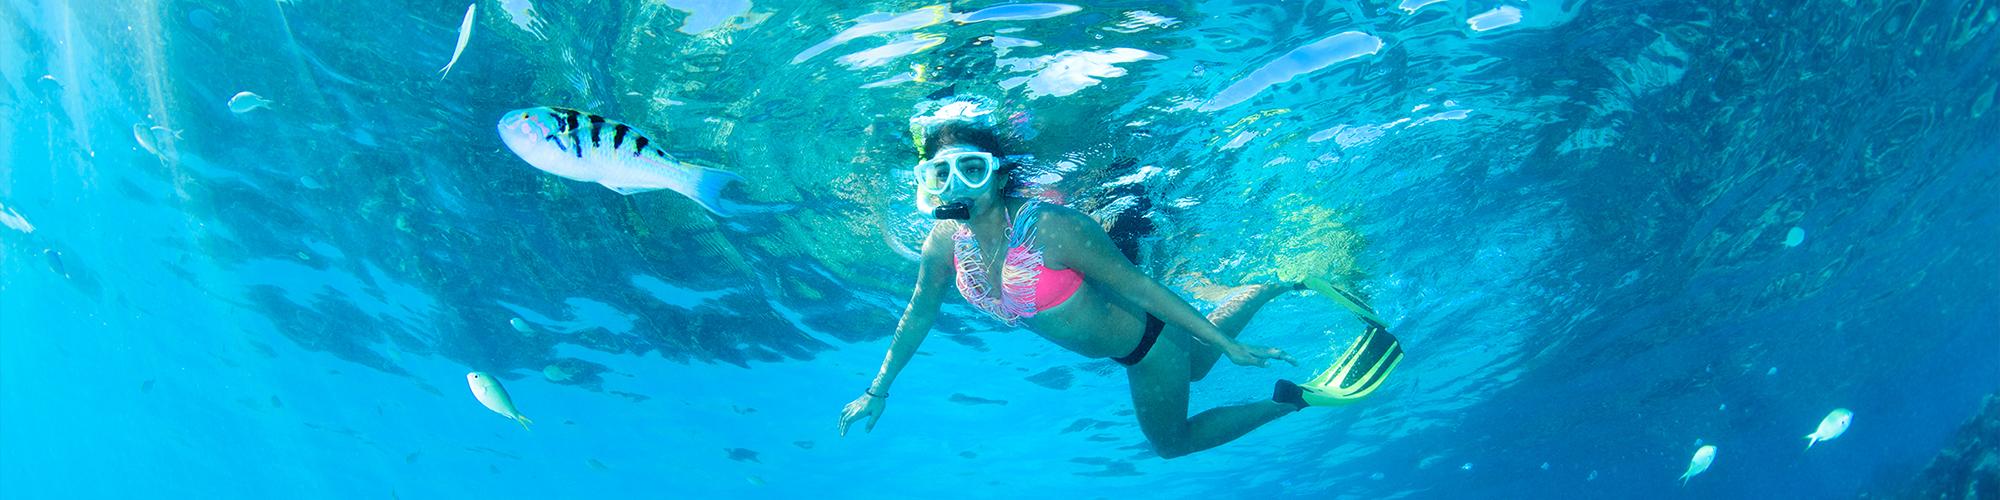 Makadi Bay Snorkeling Trips -Snorkeling in Makadi Bay - Tours From Hurghada